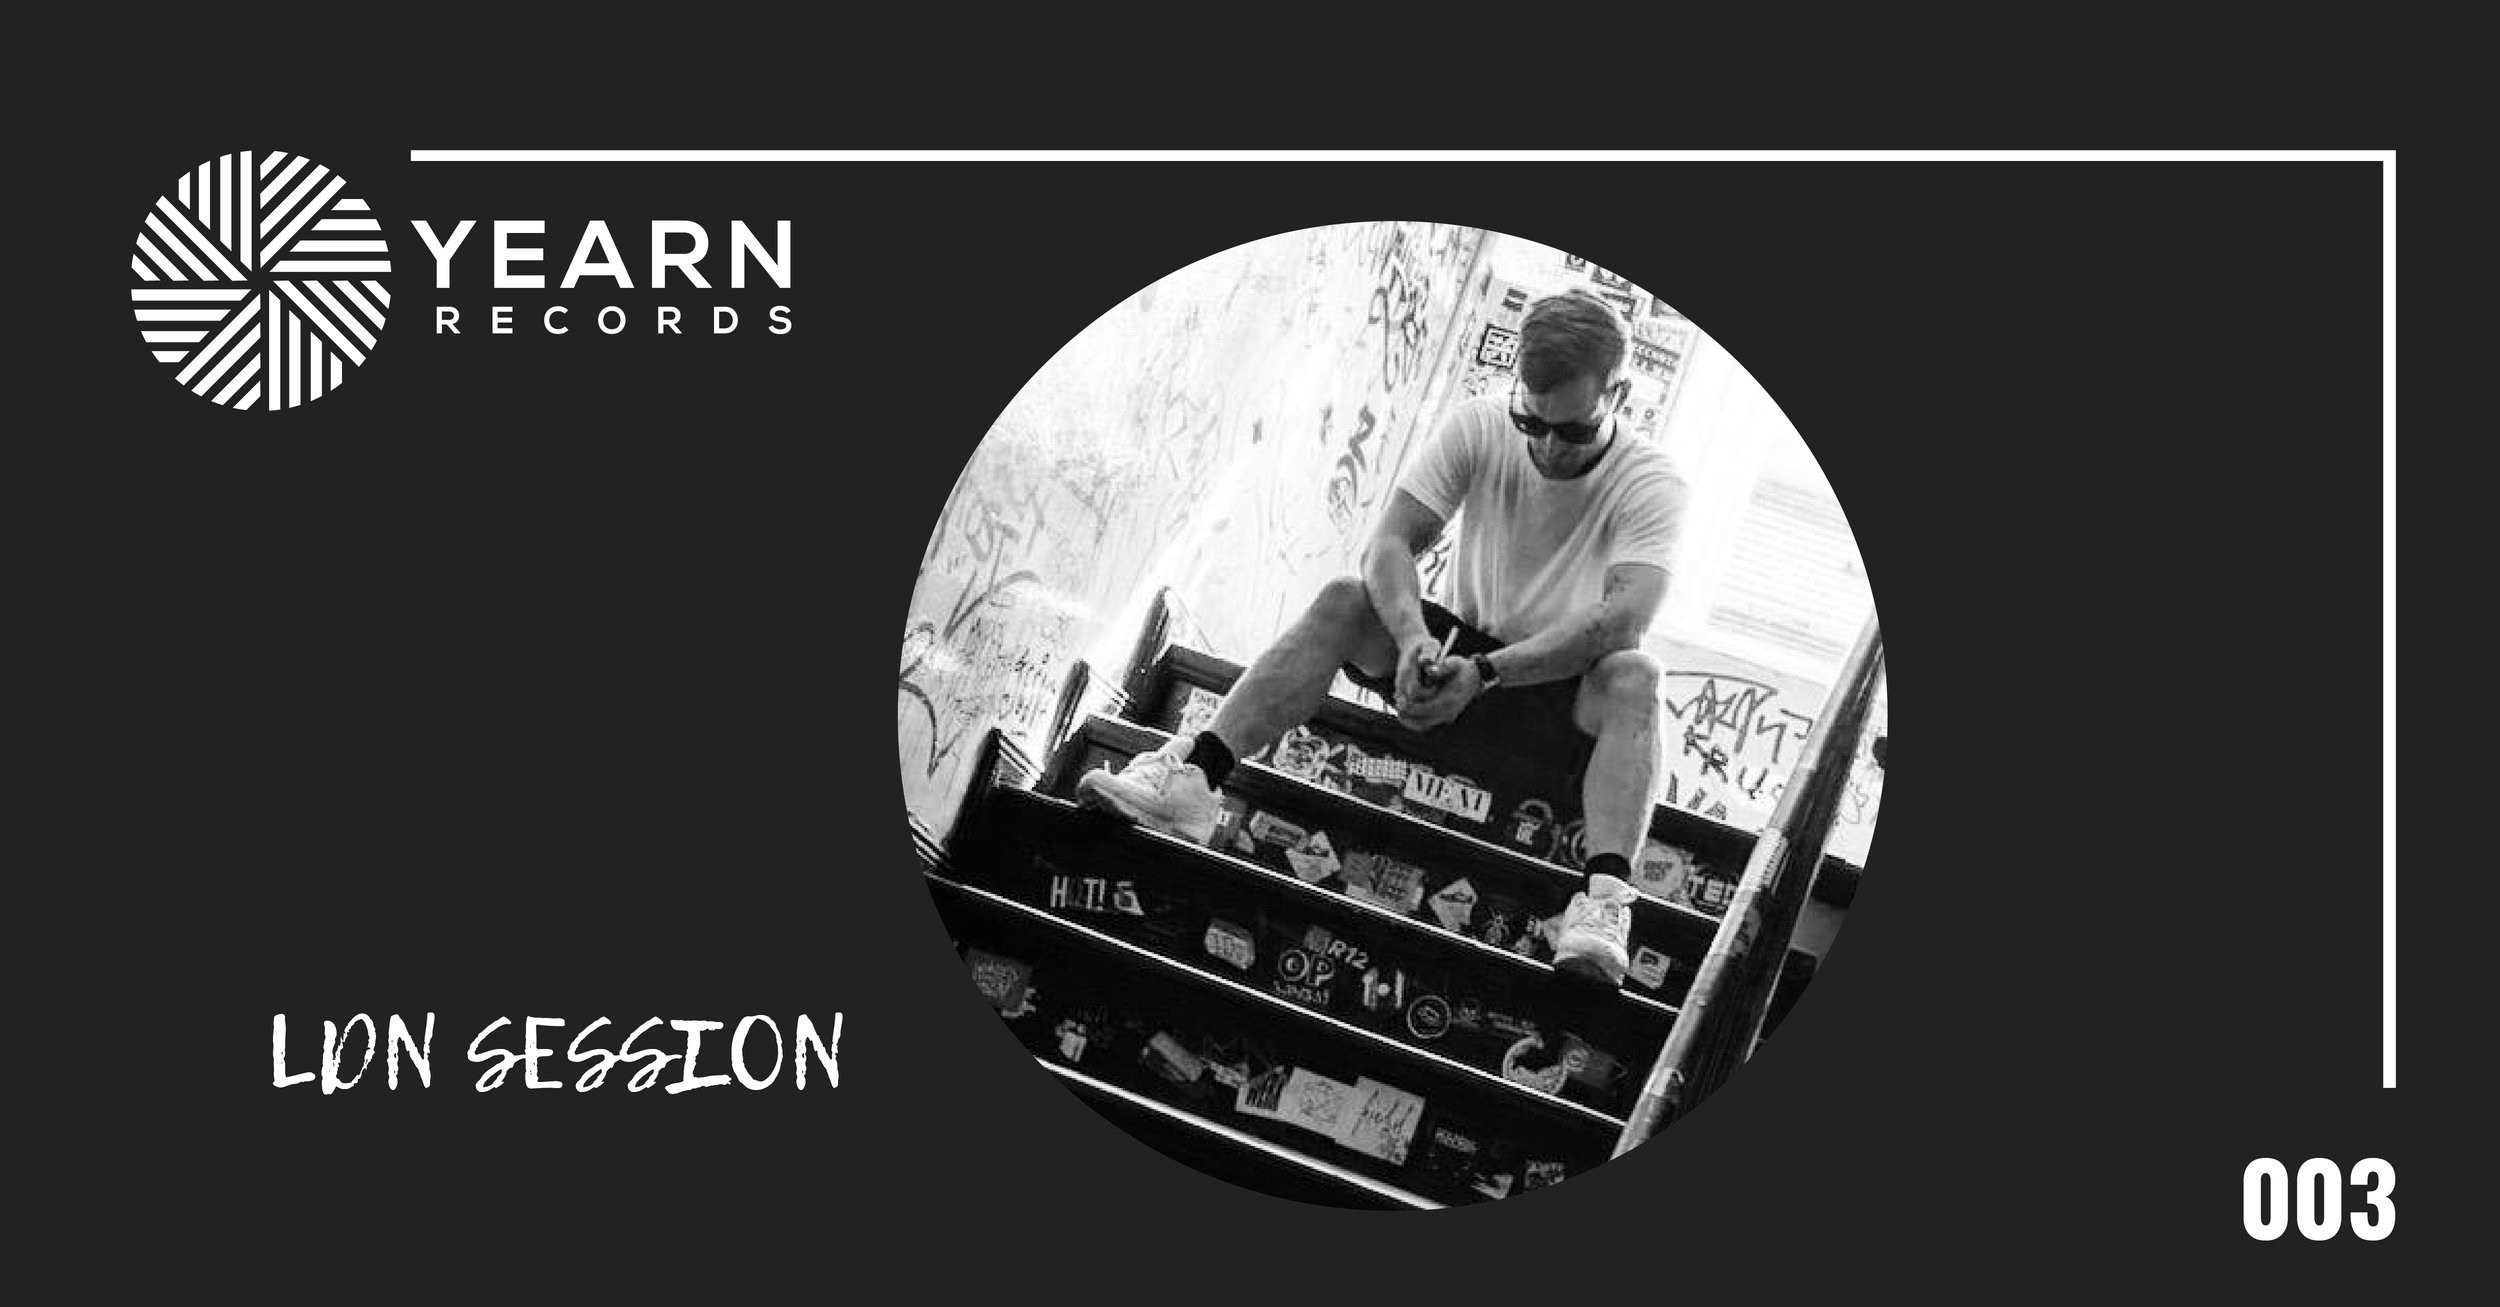 003-LDN Sessions-yr-banner-01-01-01.jpg